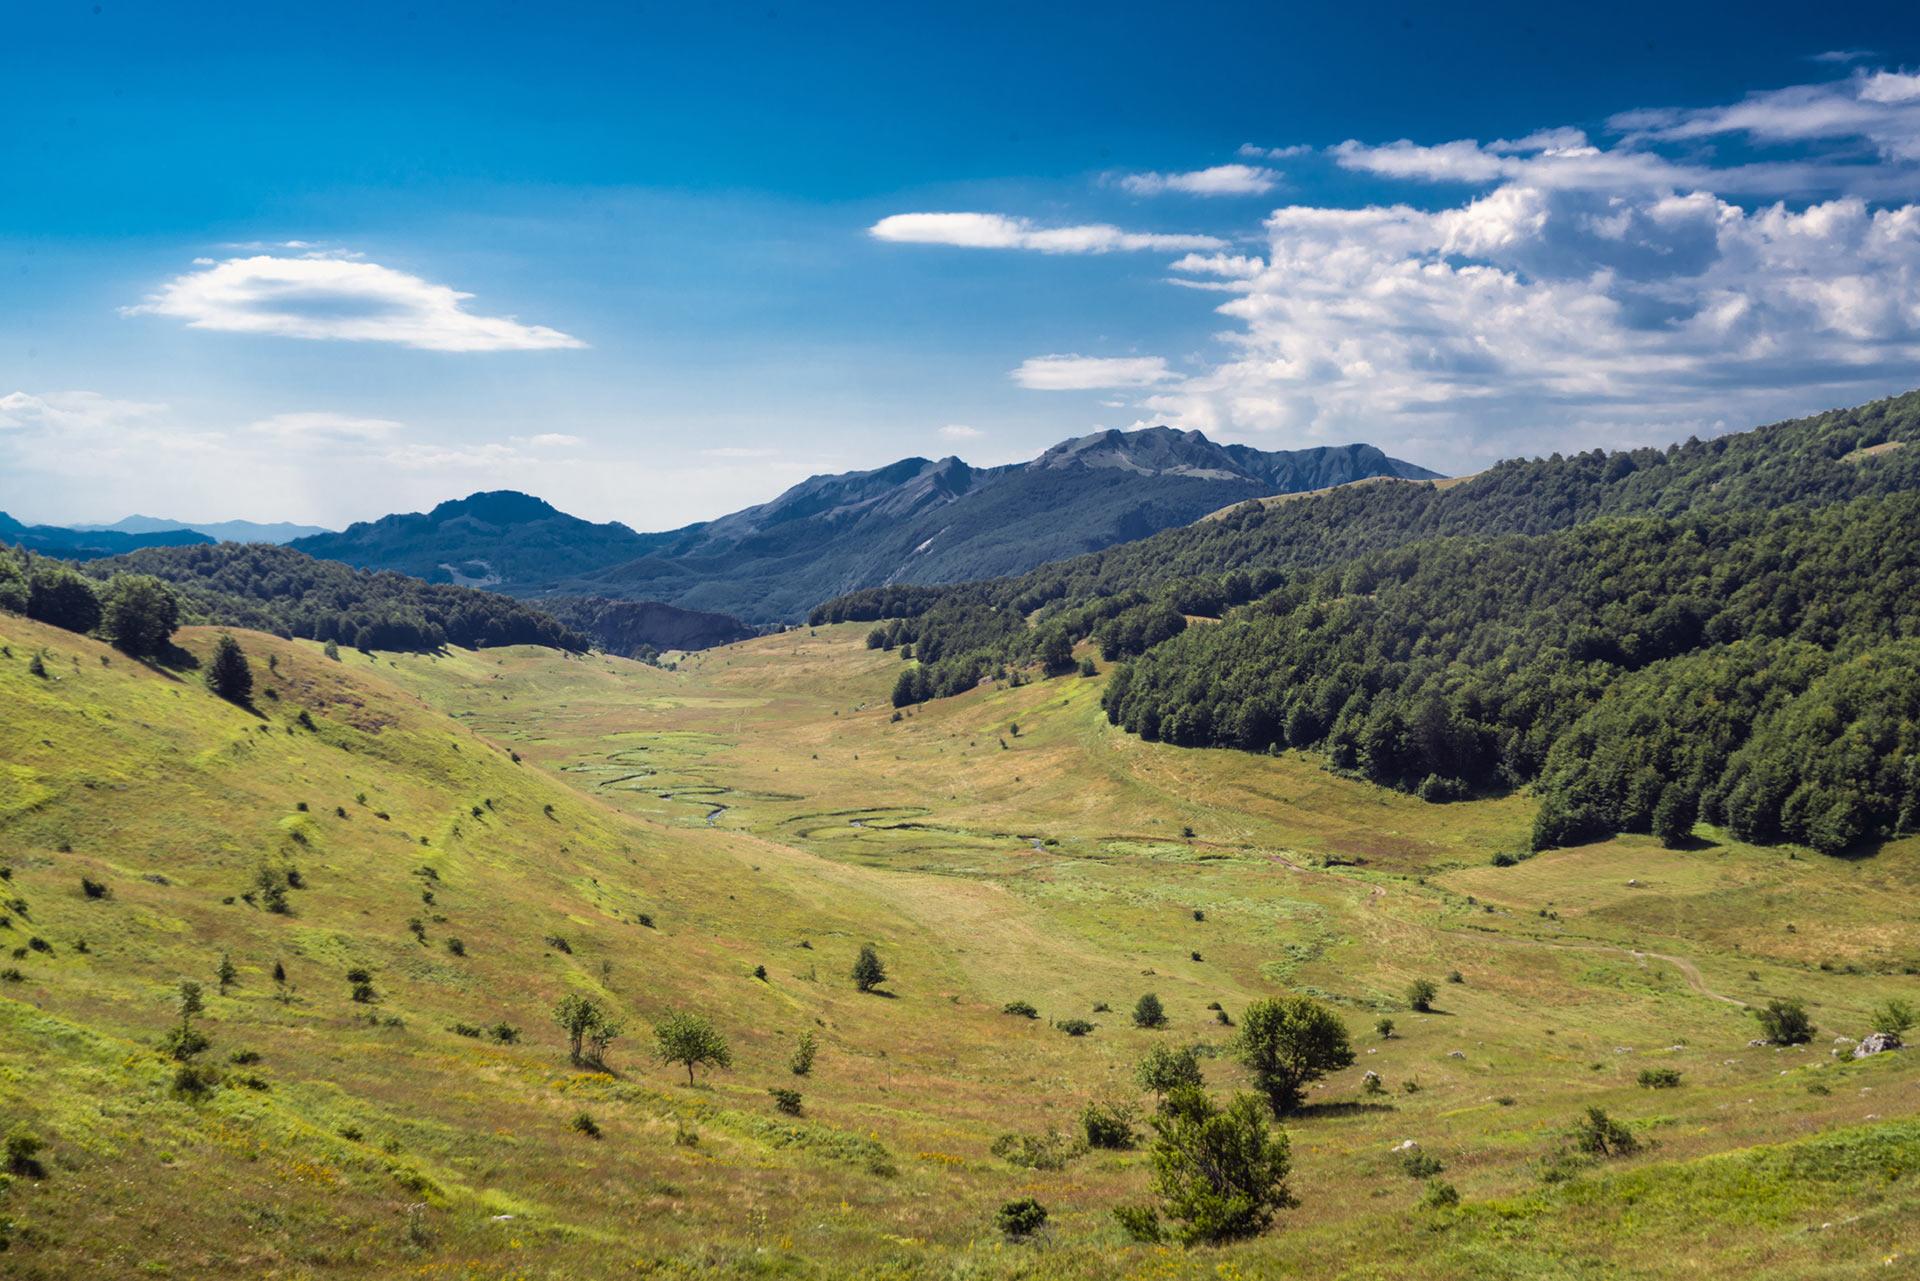 View of Studeni potok, Bosnia and Herzegovina